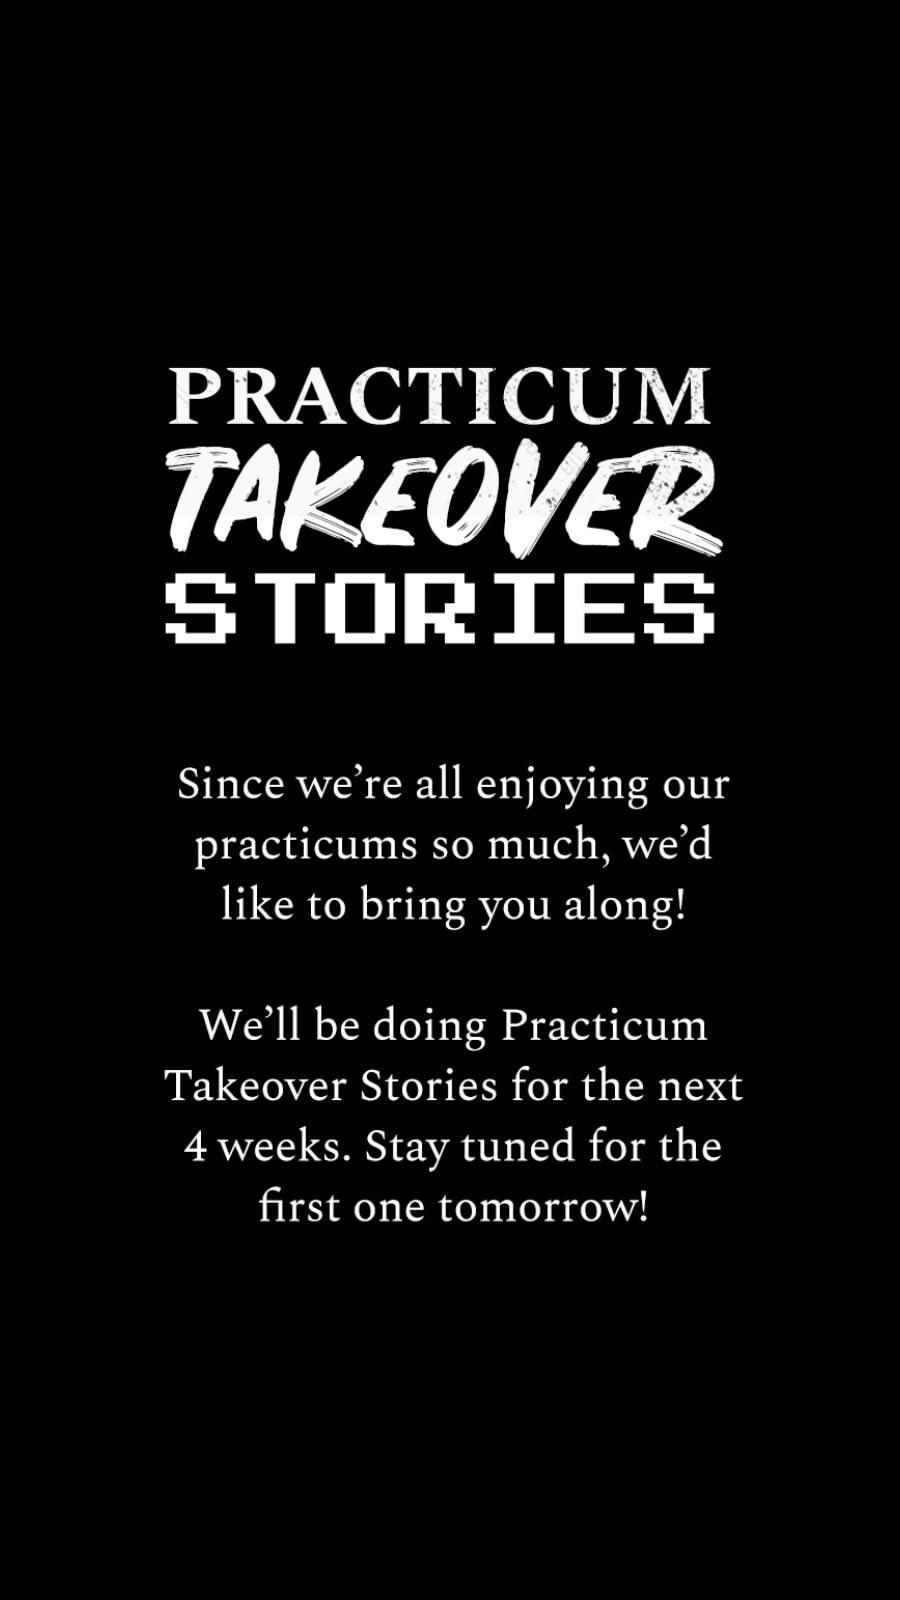 Practicum Takeover Stories